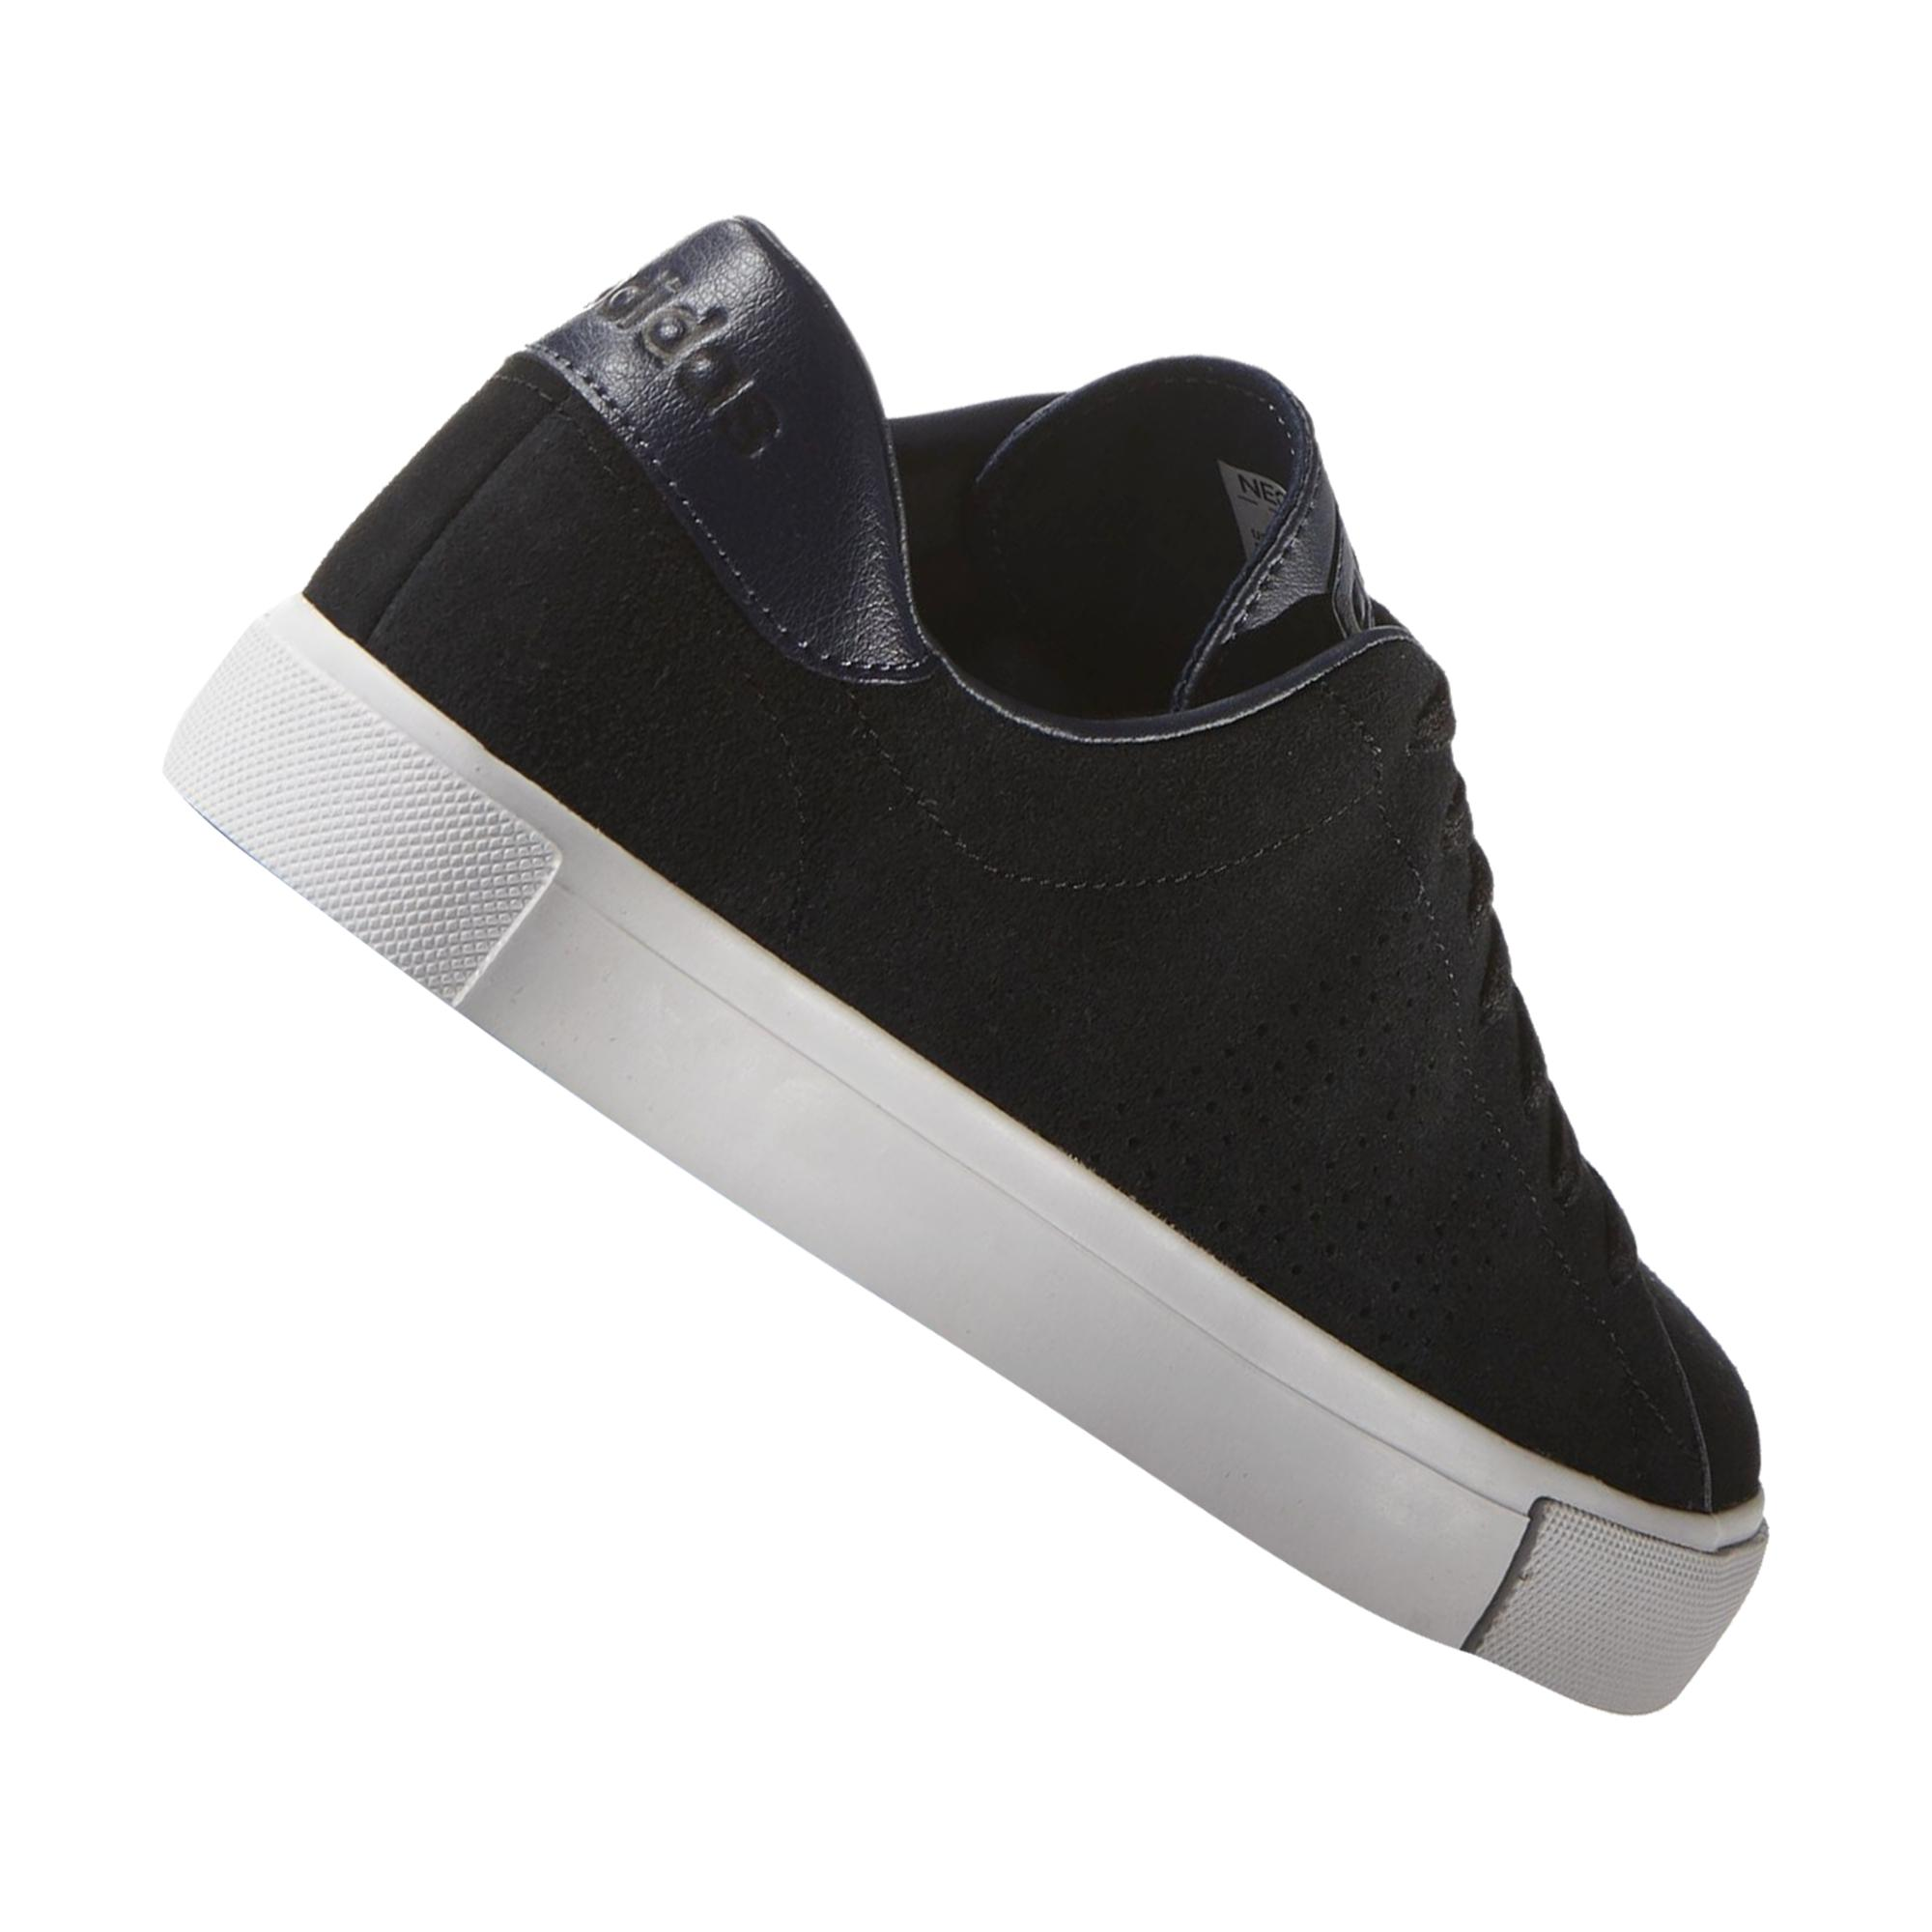 adidas Daily Line SS16 Erkek Spor Ayakkabı